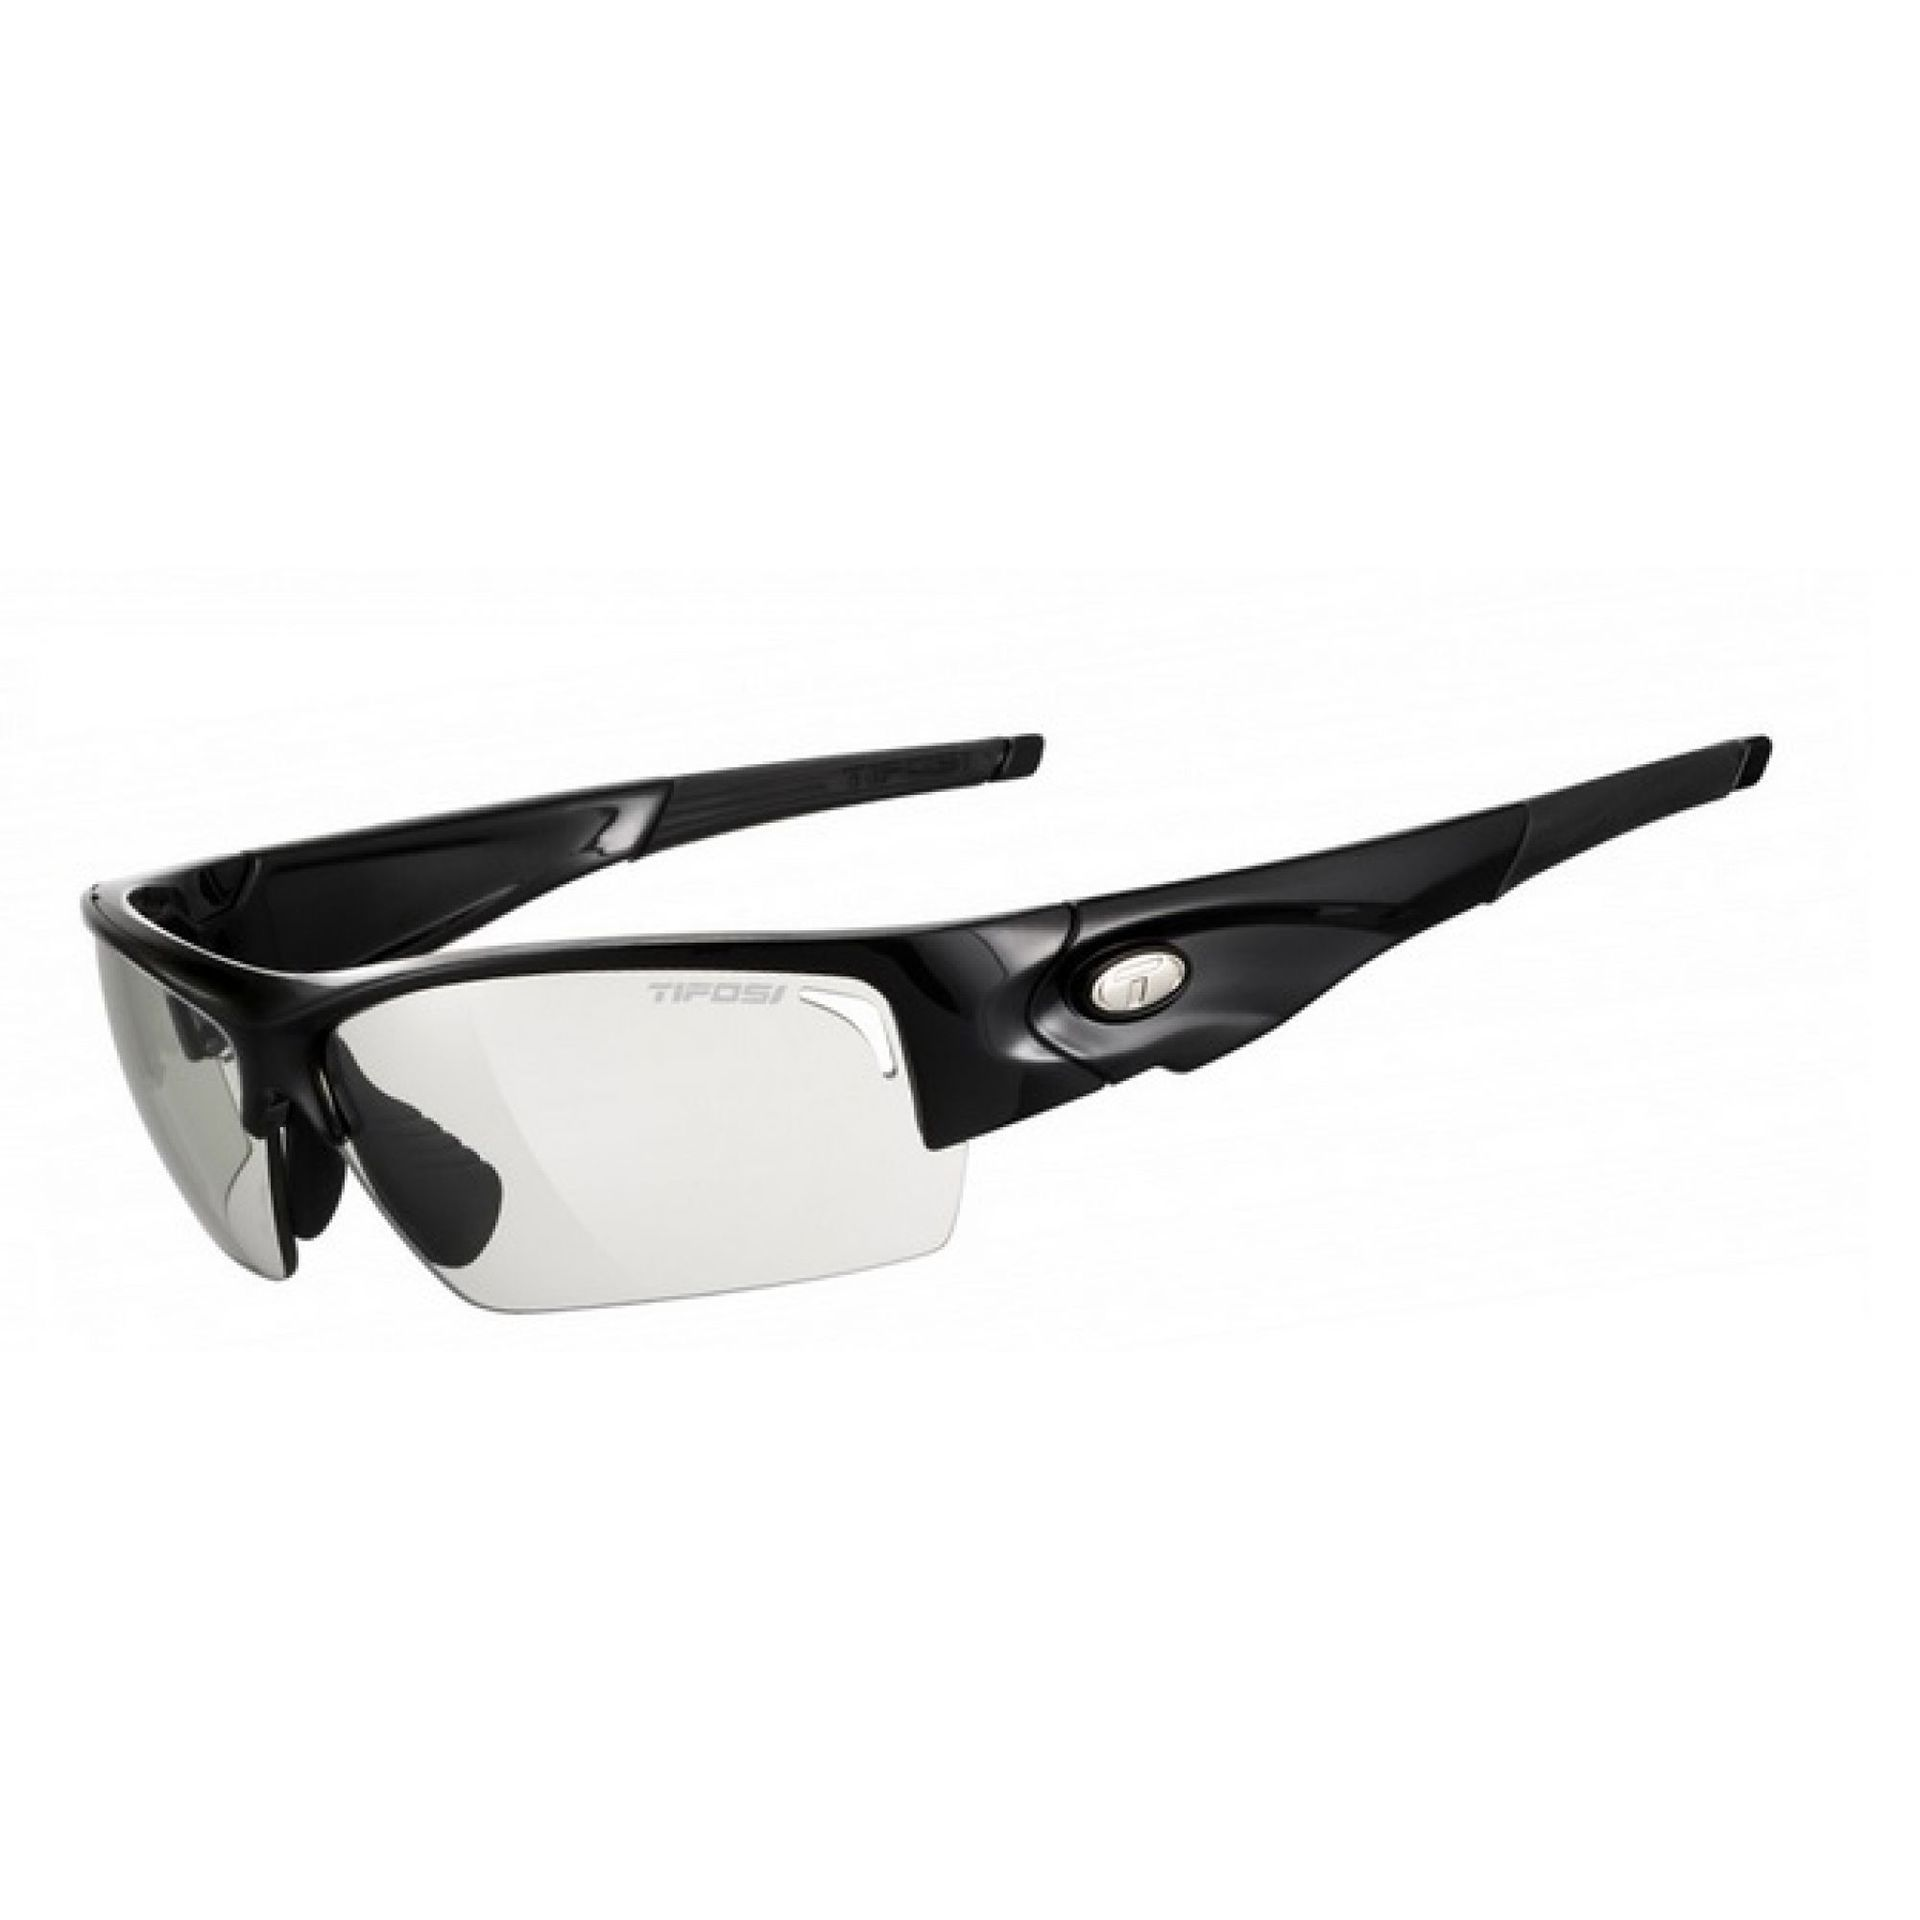 Okulary Tifosi Lore gloss black